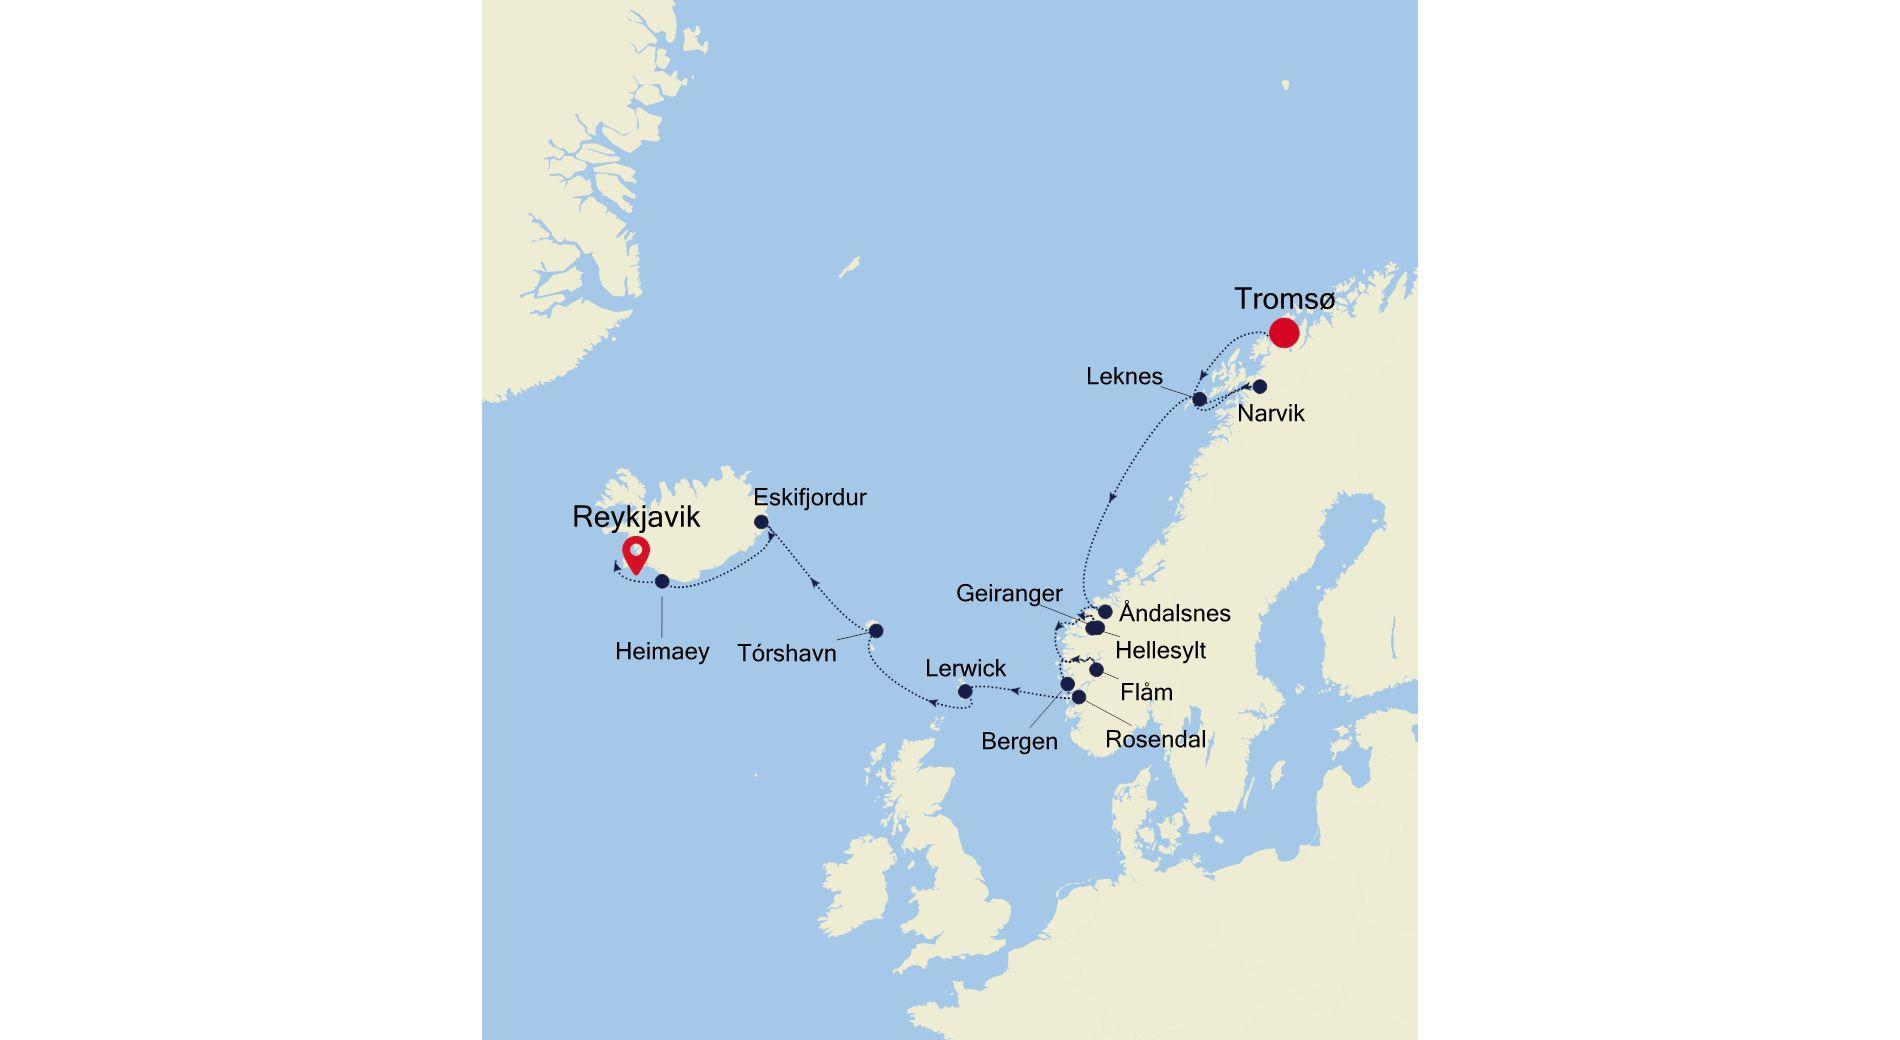 WH210807014 - Tromsø a Reykjavik